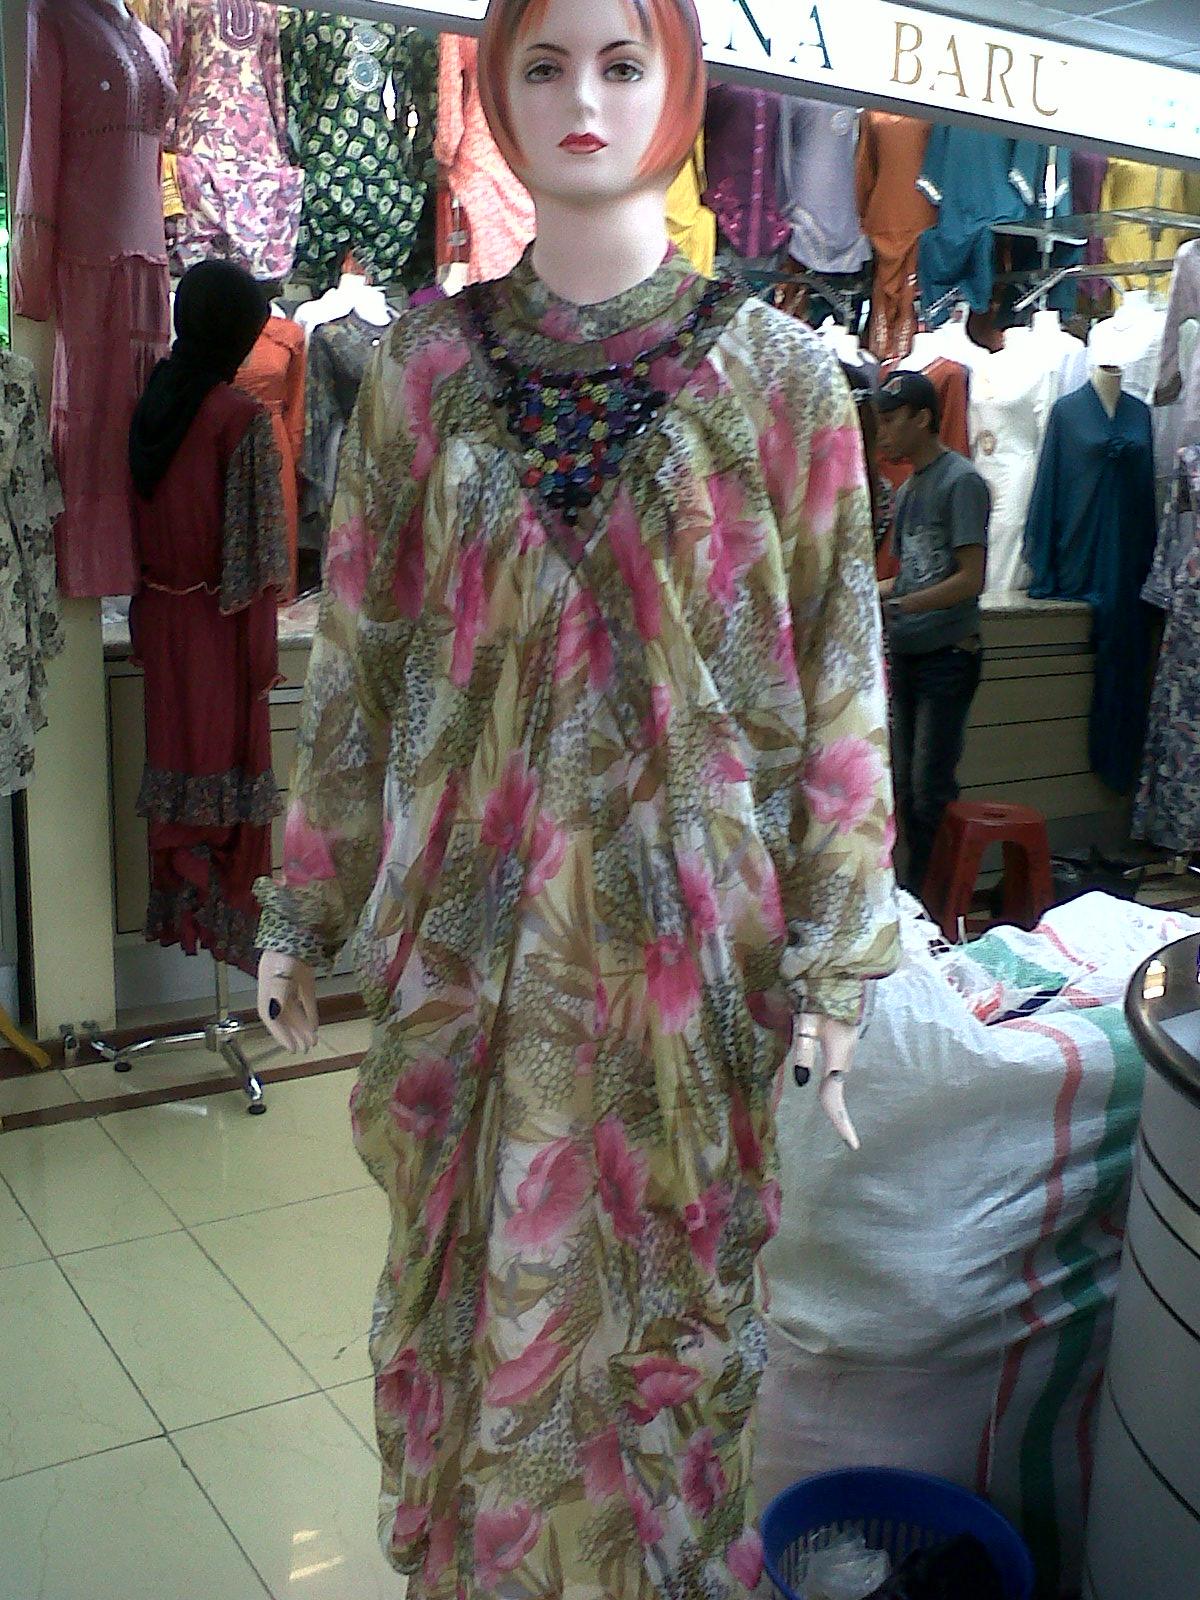 Gaya Busana Koleksi Fashion Gamis Gaun Syahrini